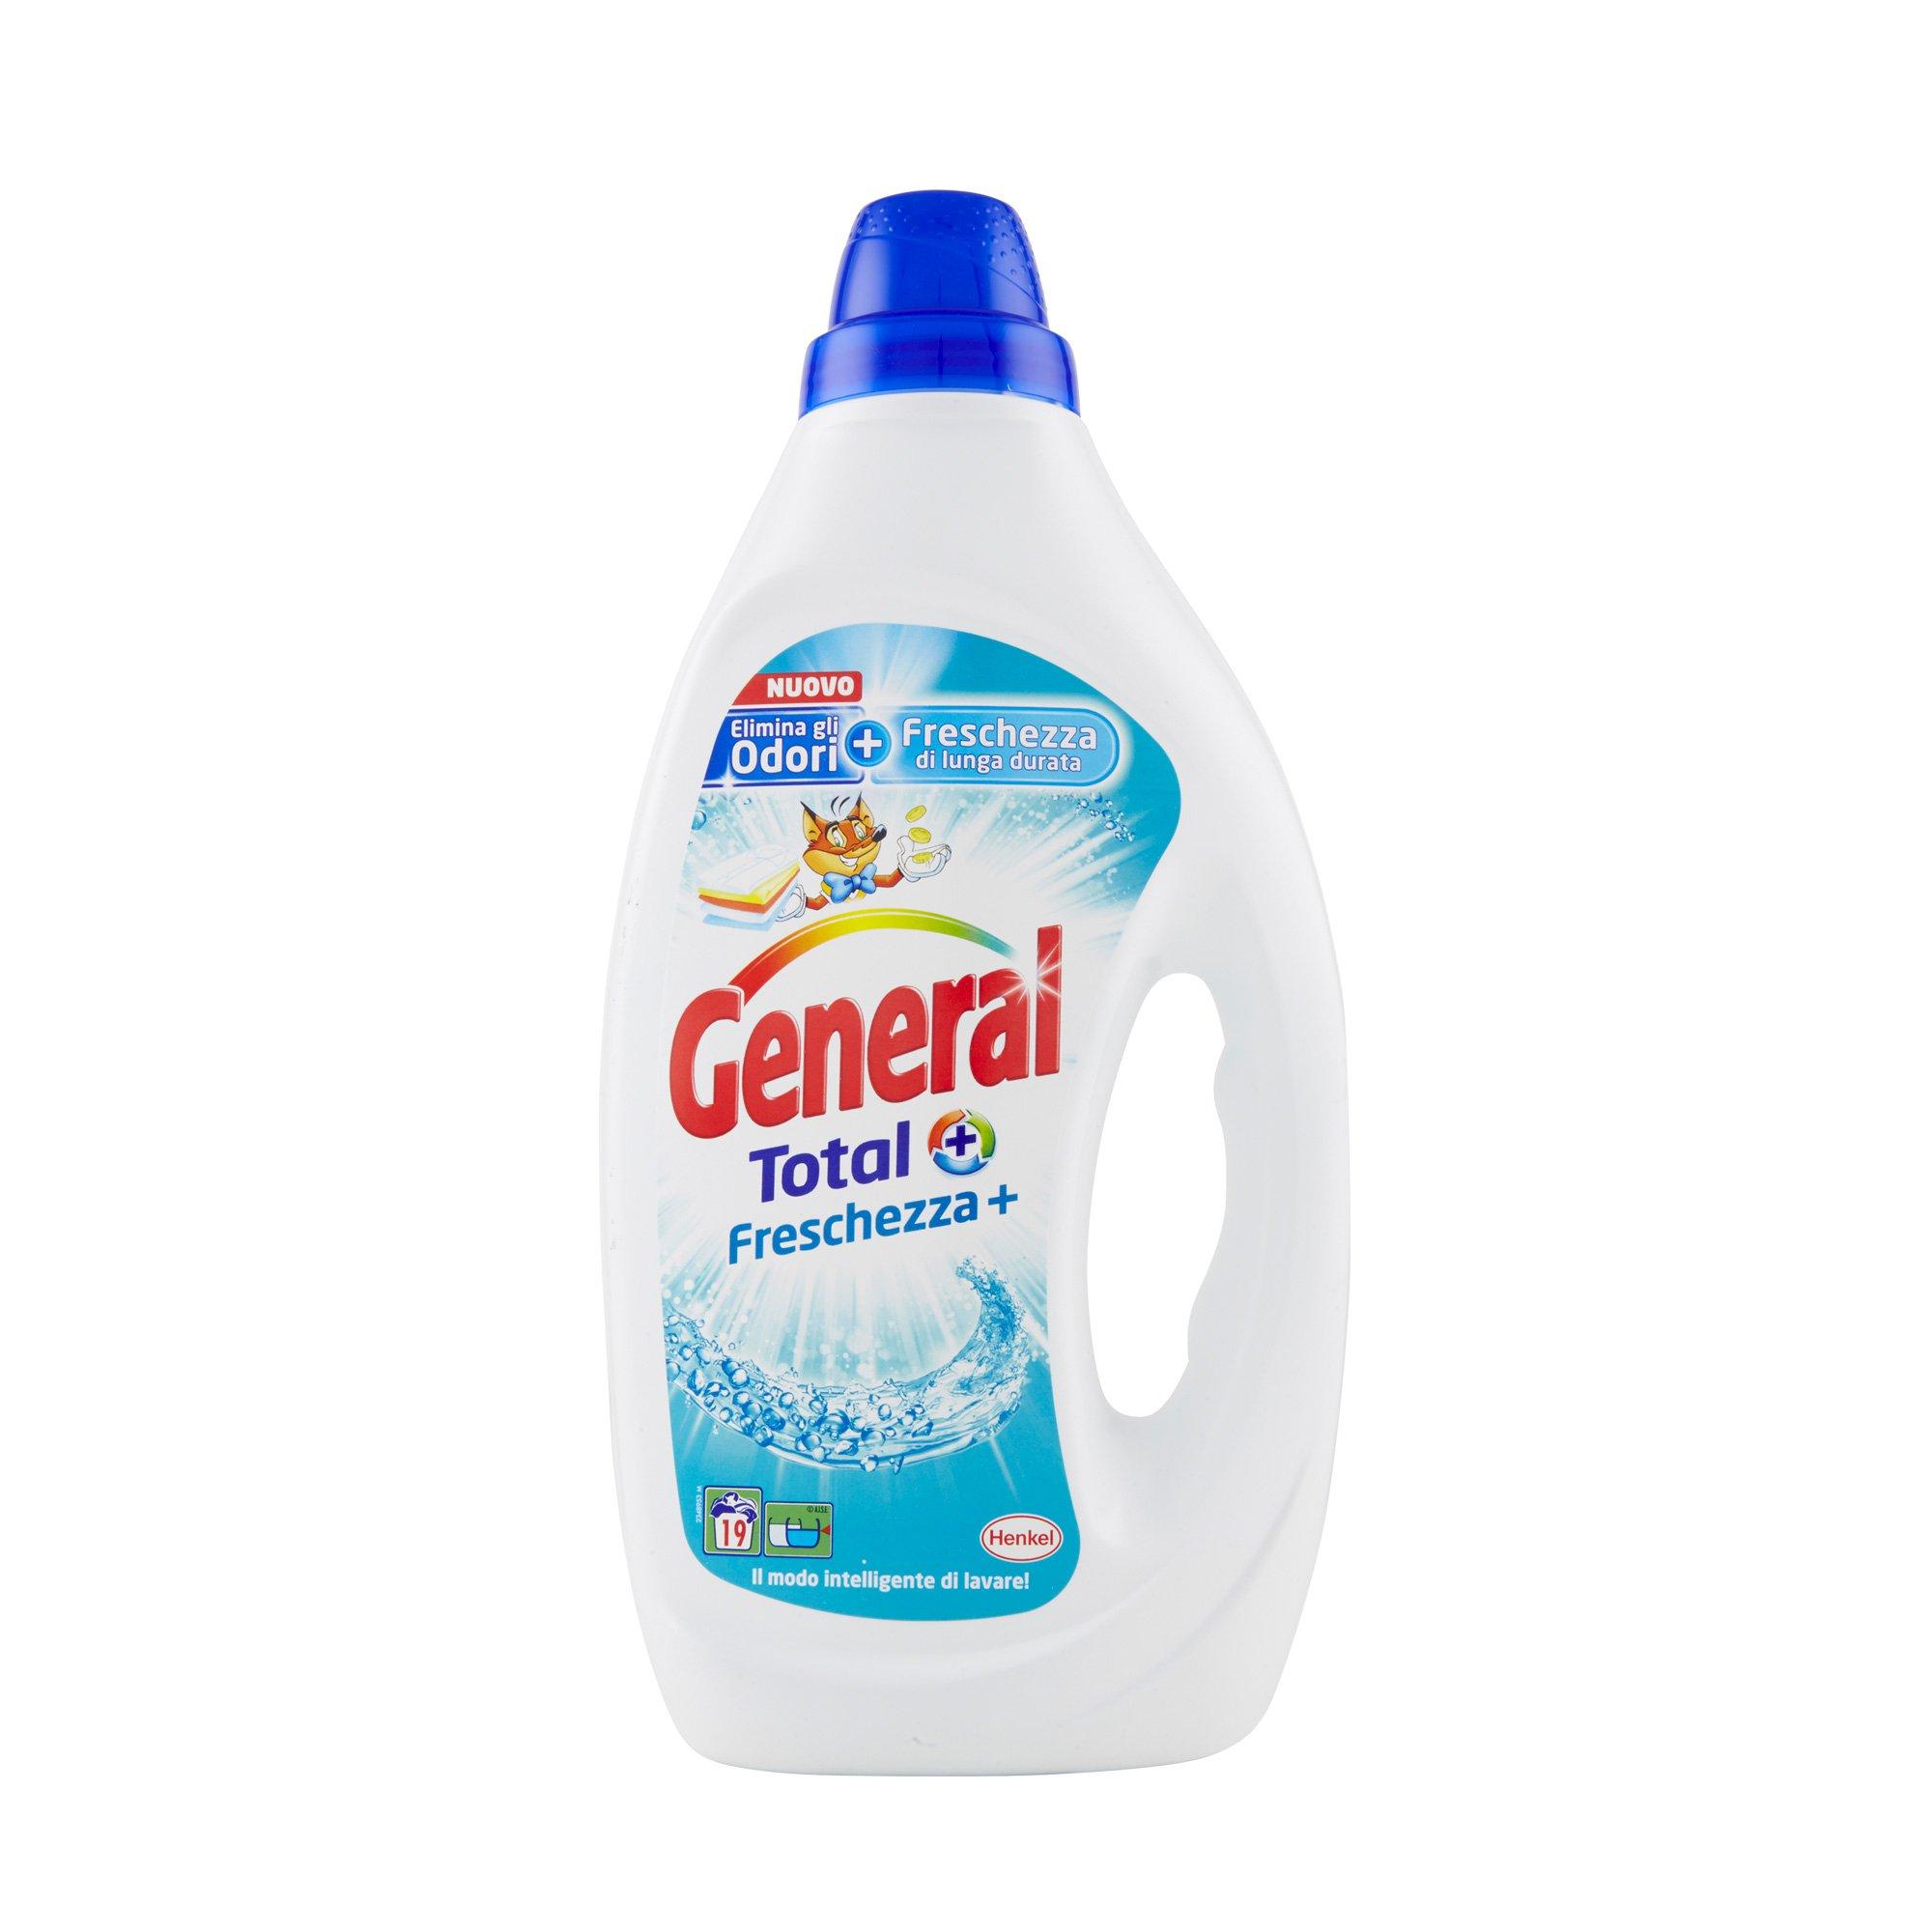 General Freschezza + 19 lavaggi